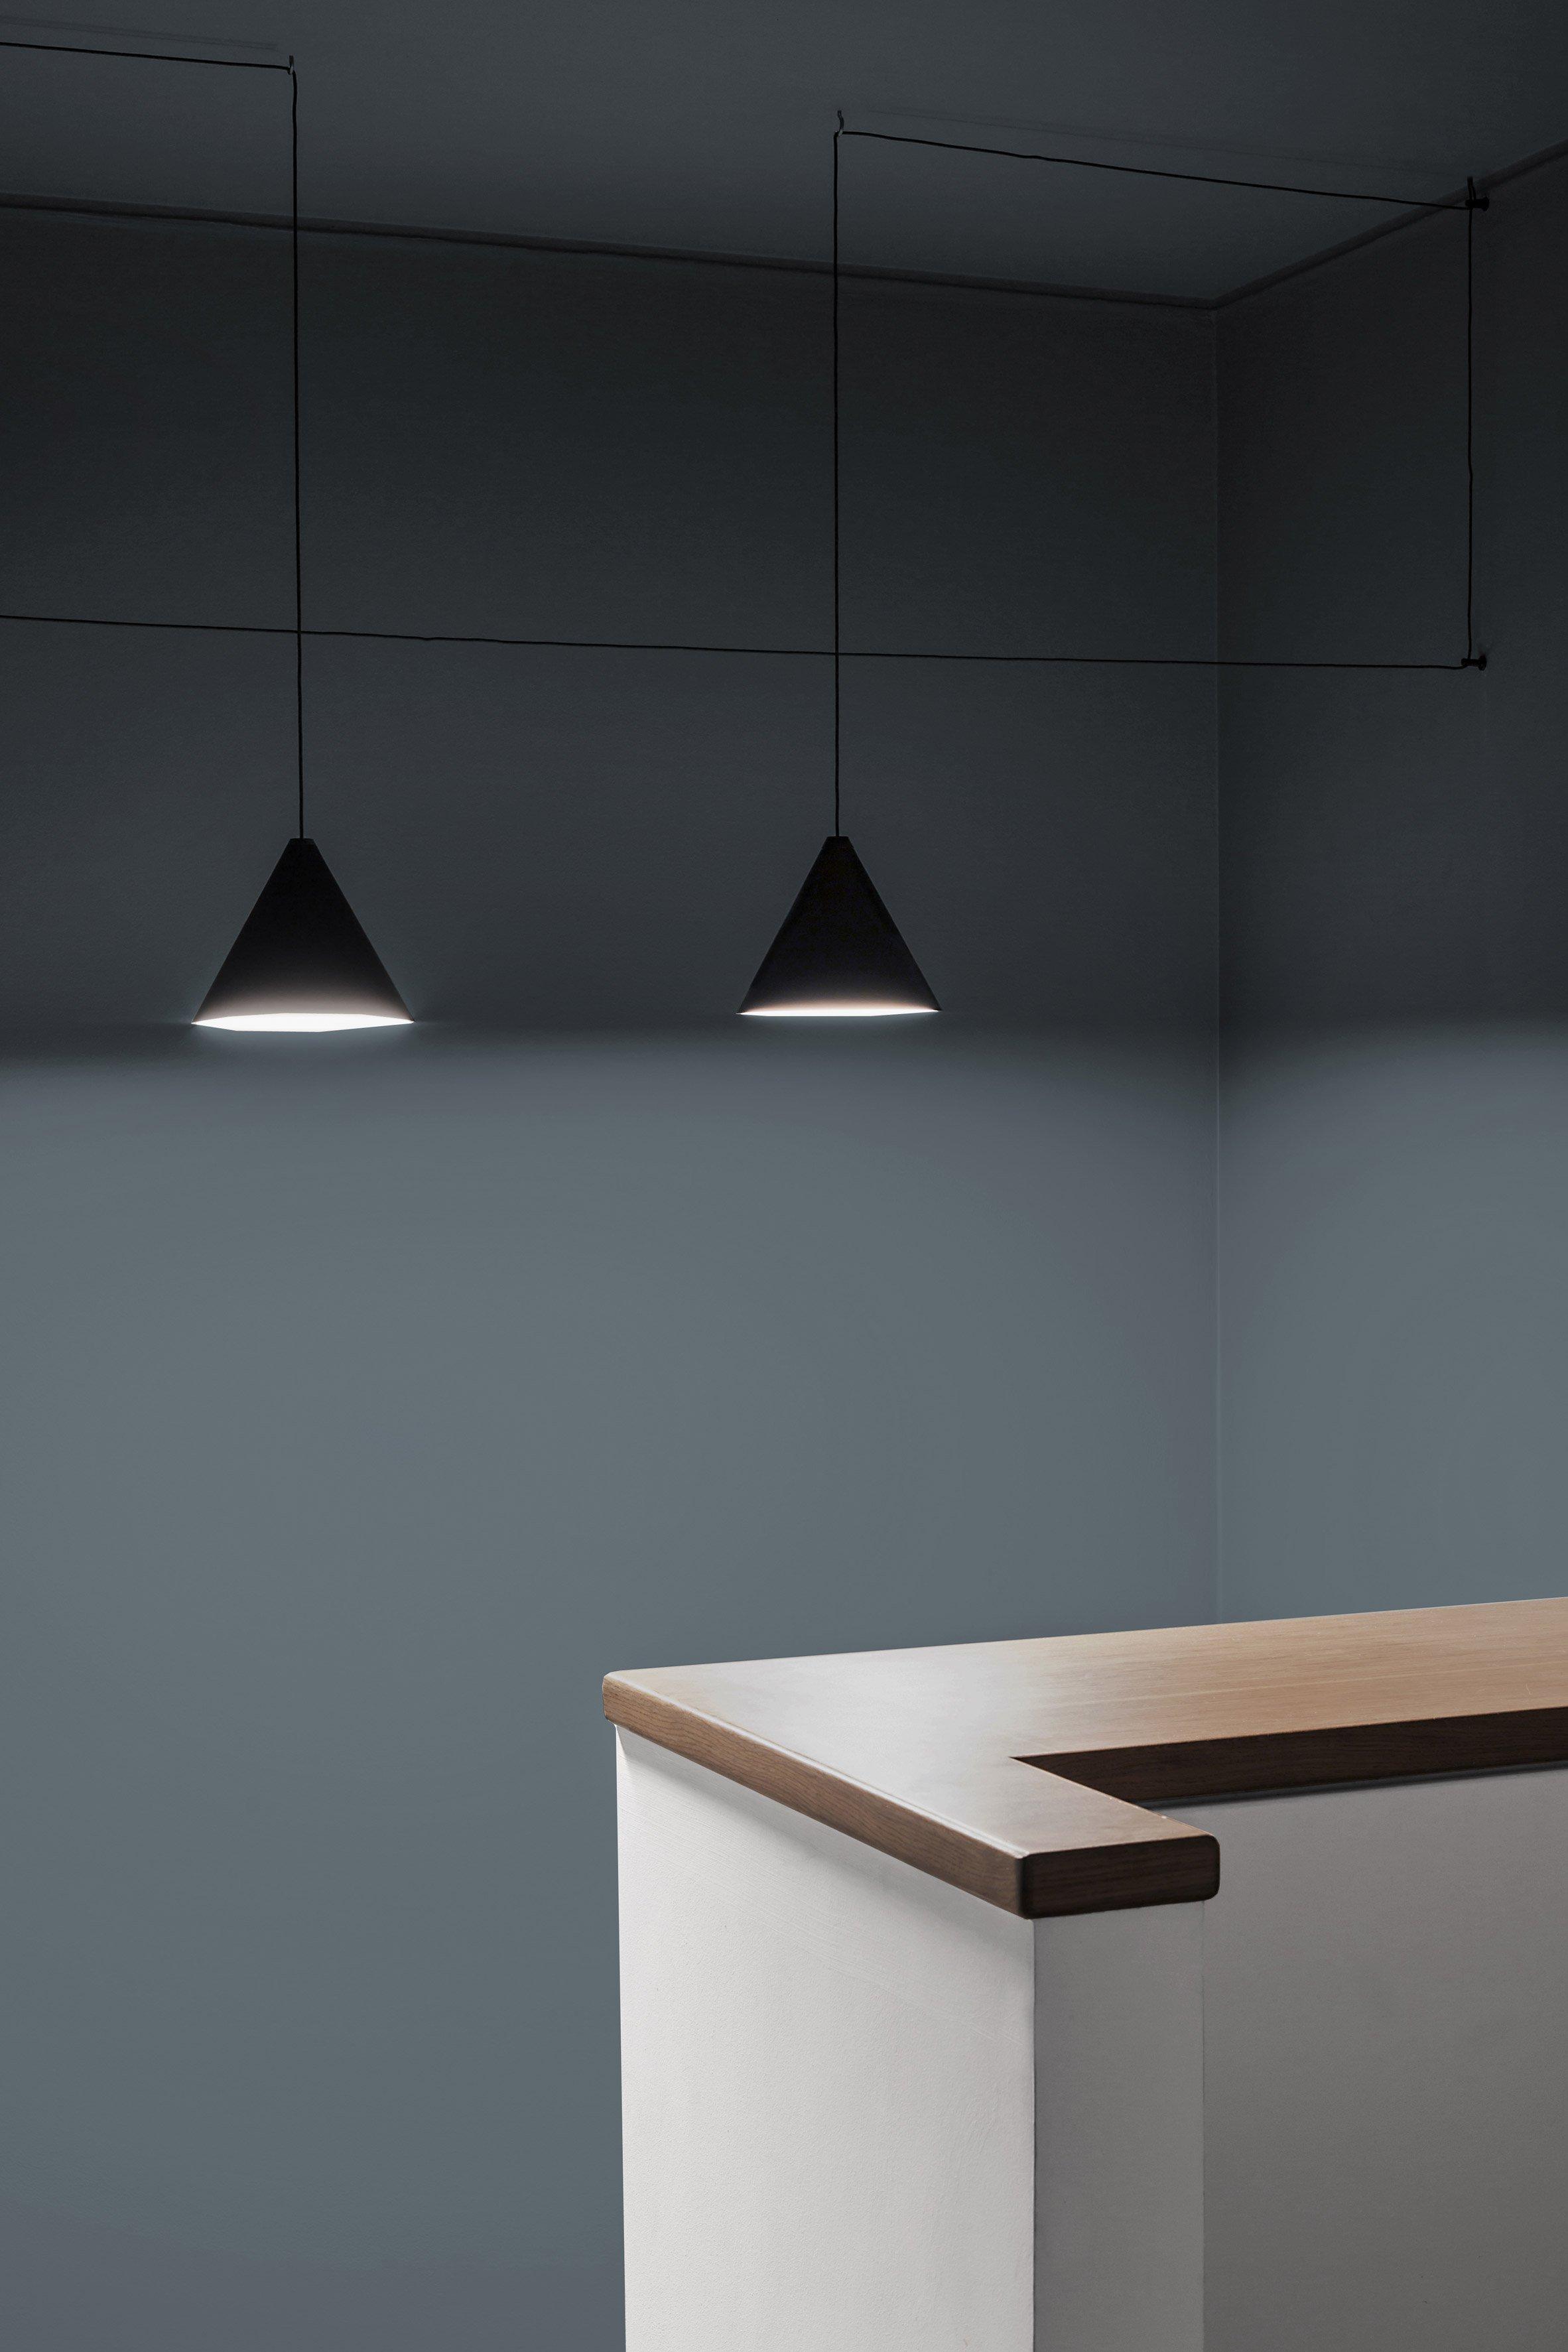 architecture-house-residential-design-studia-interiors-osnovadesign-osnova-poltava_17